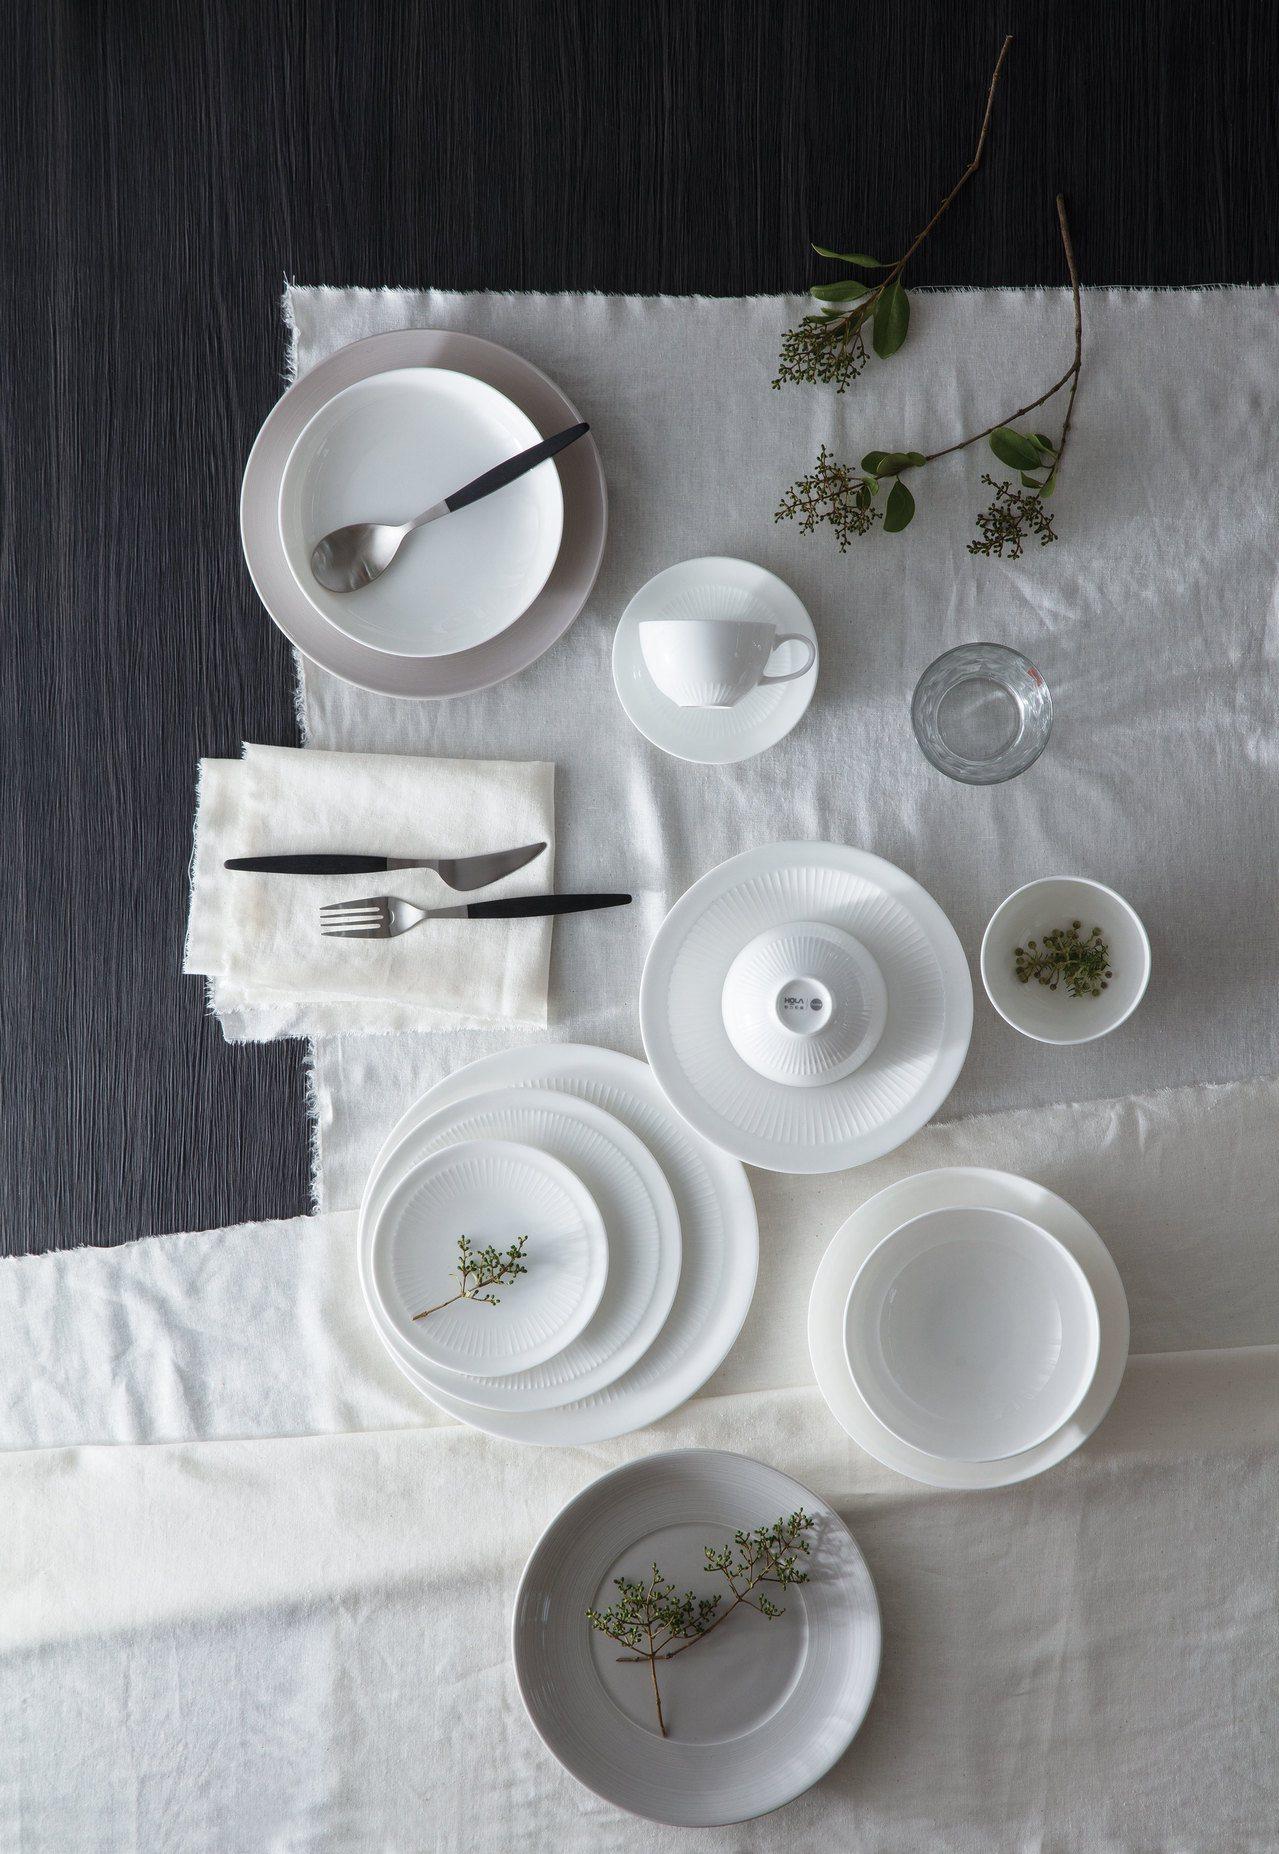 HOLA緻白骨瓷系列,榮登2017年最熱銷餐具。圖/HOLA提供